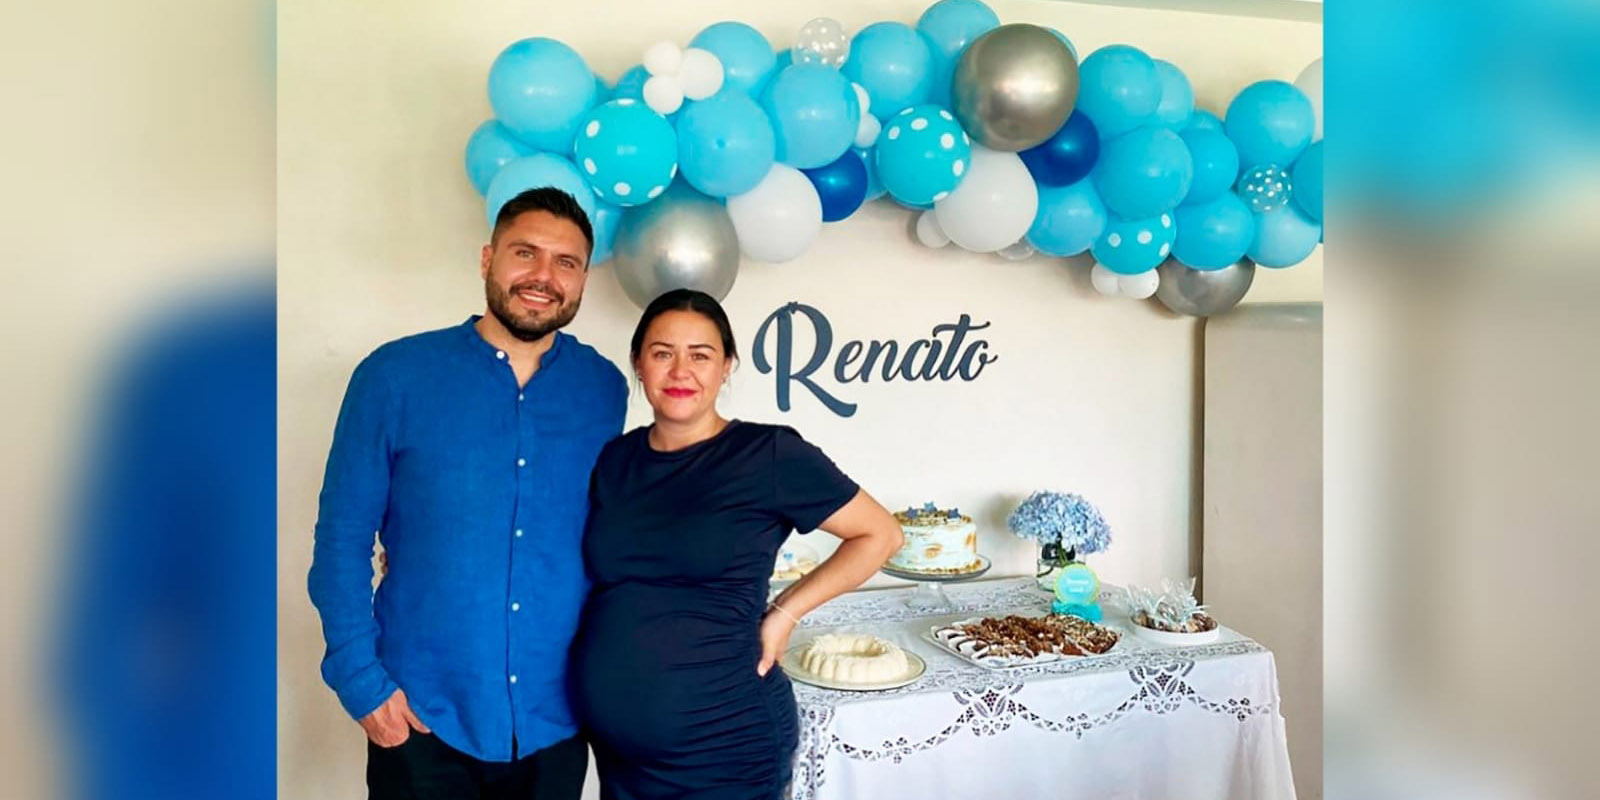 ¡Esperan a Renato! | El Imparcial de Oaxaca